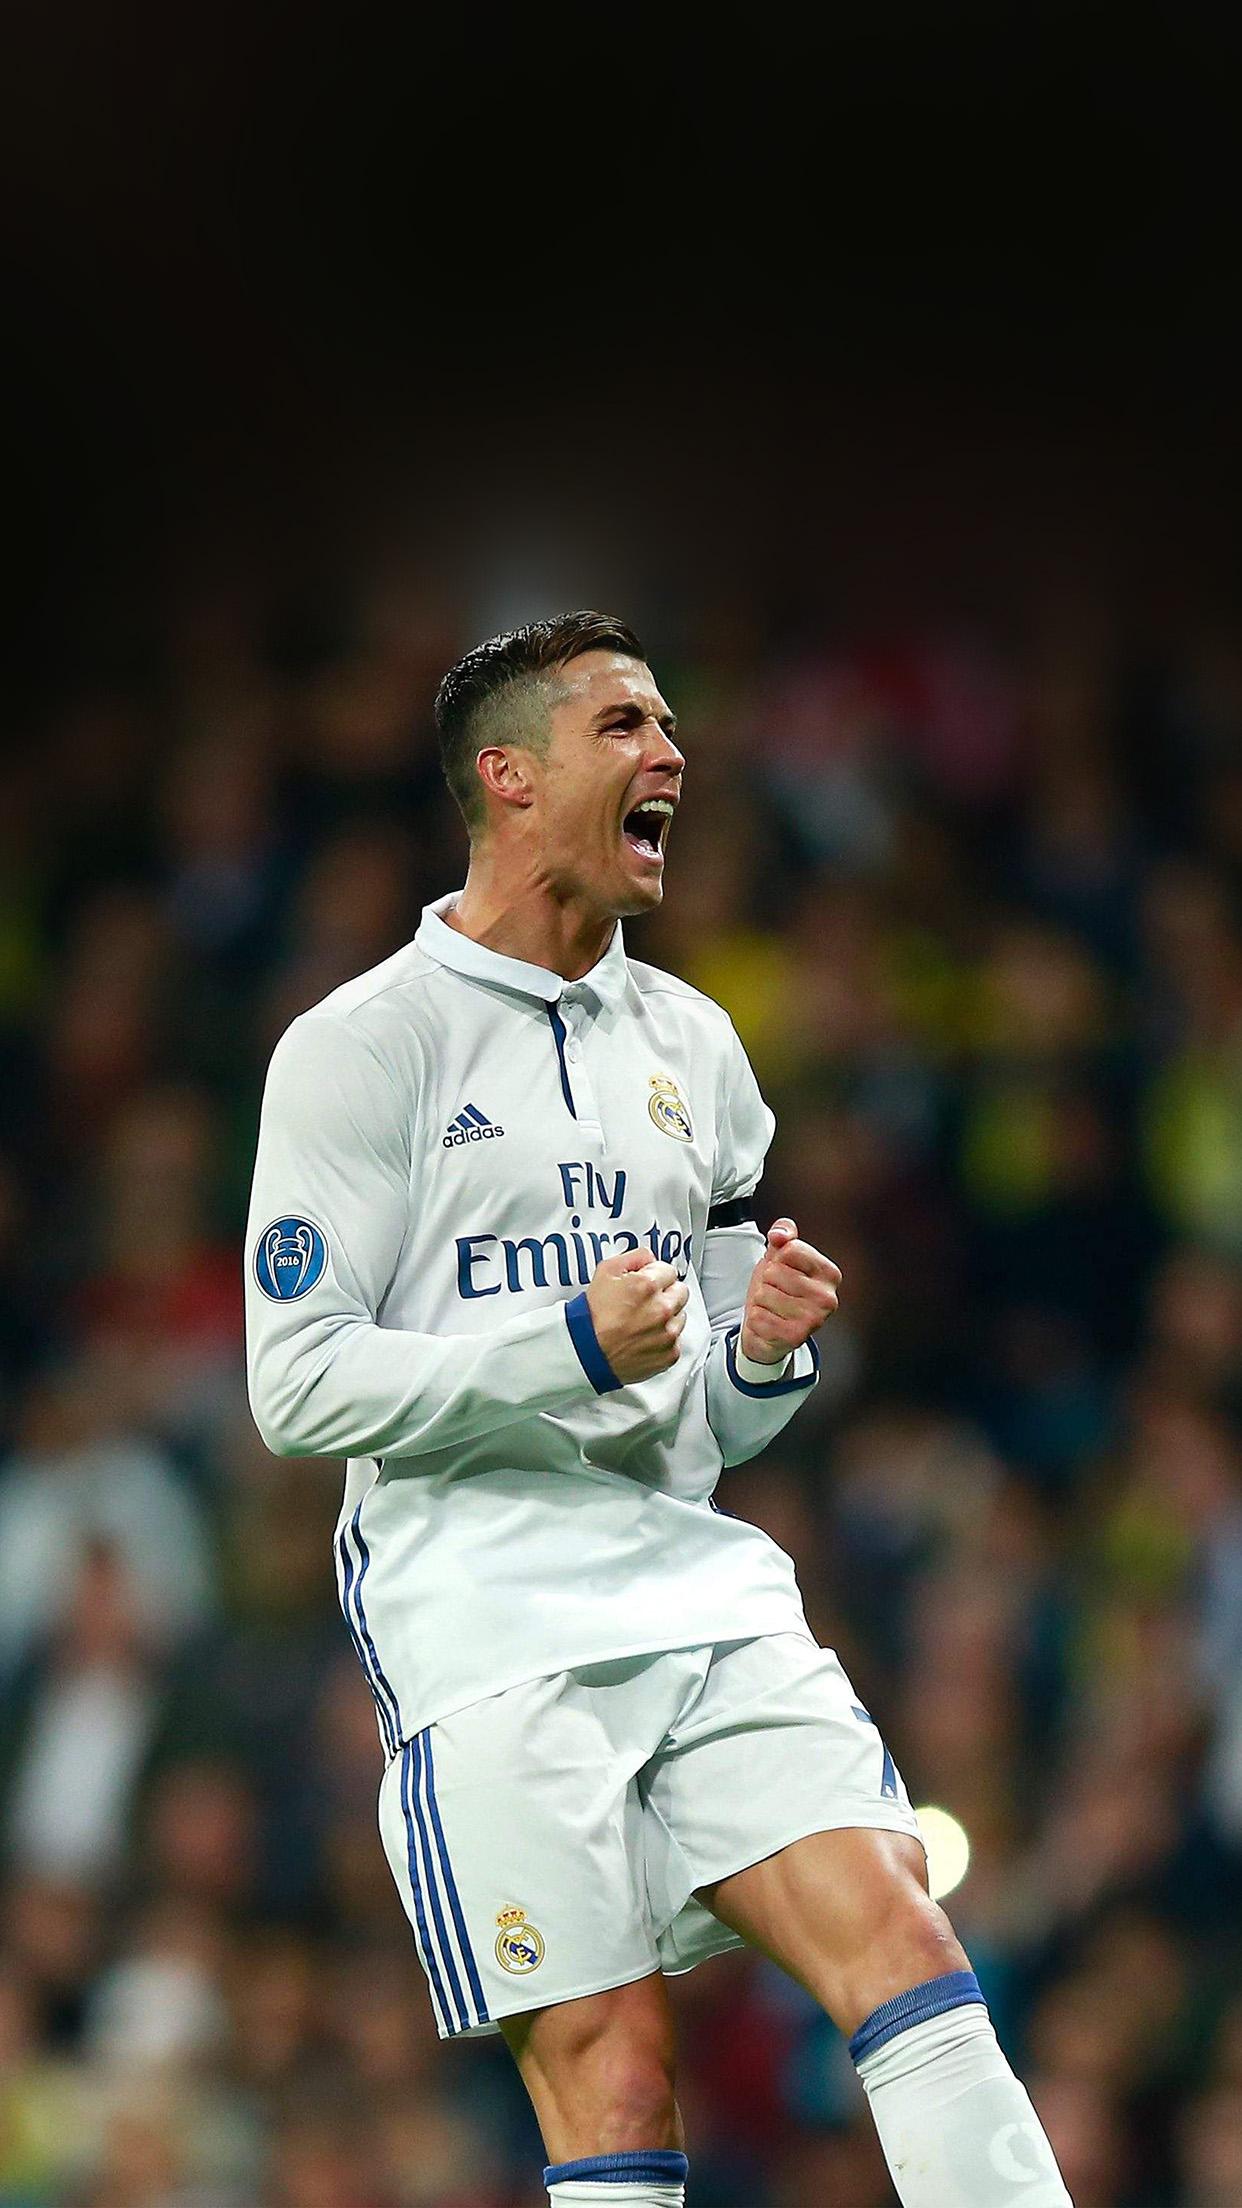 Cr7 Wallpaper Iphone Hm22 C Ronaldo Soccer Real Madrid Sports Wallpaper